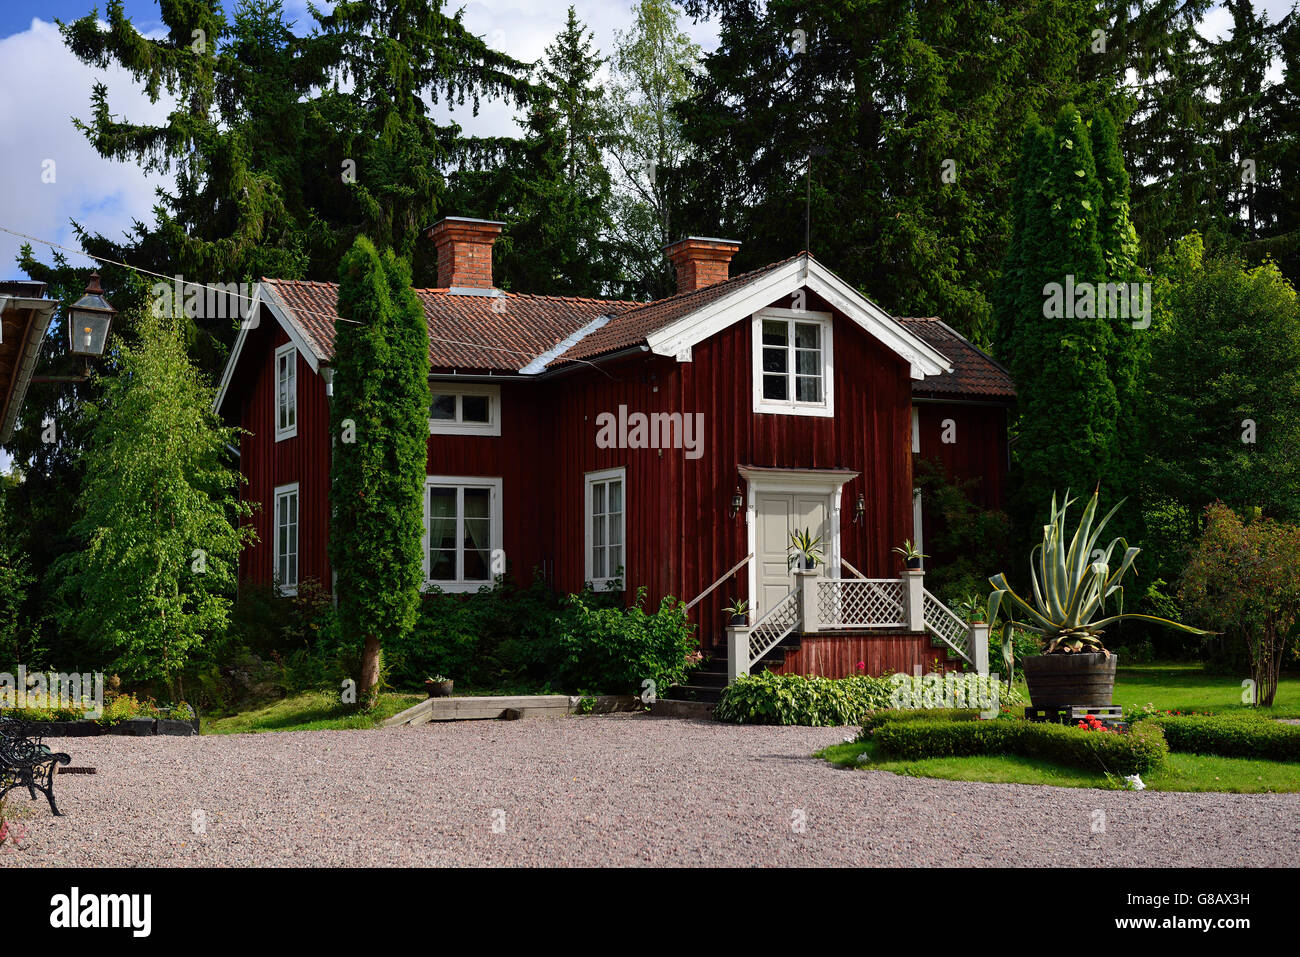 Stora Hyttnas, Sundborn, Dalarna, Sweden - Stock Image